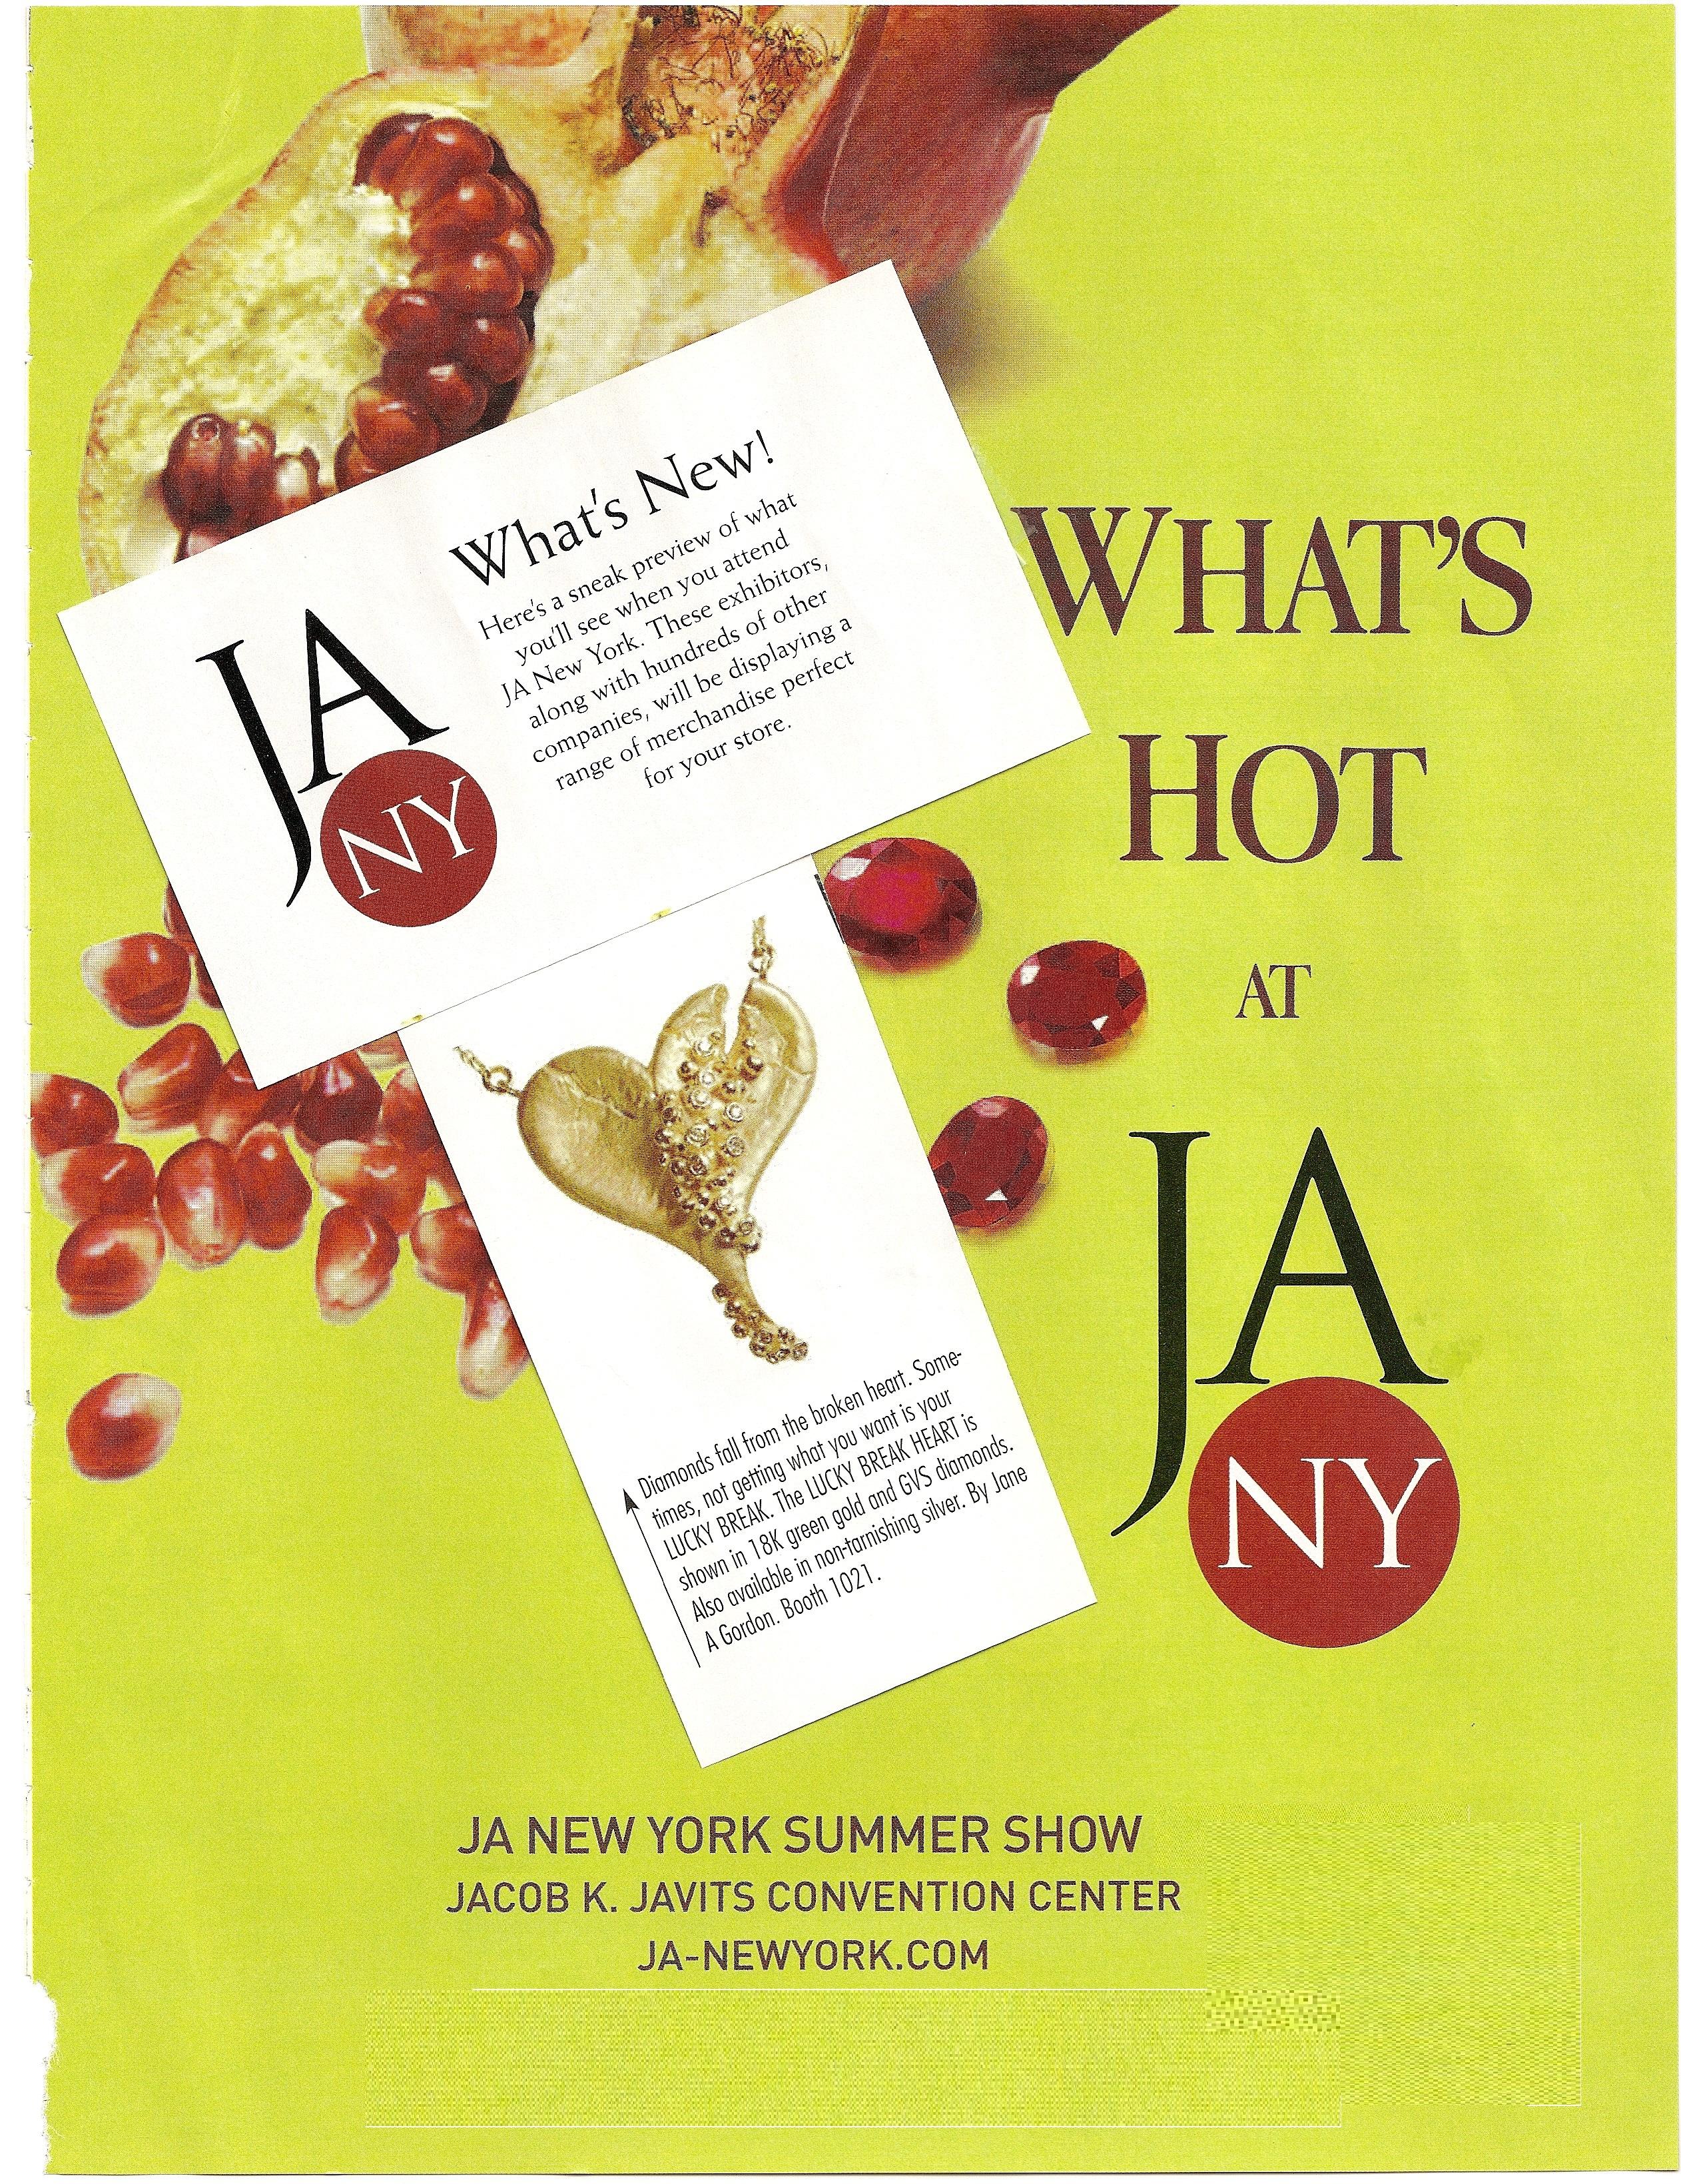 ja-show-what-s-hot-jane-a-gordon-on-janegordon-com.jpg